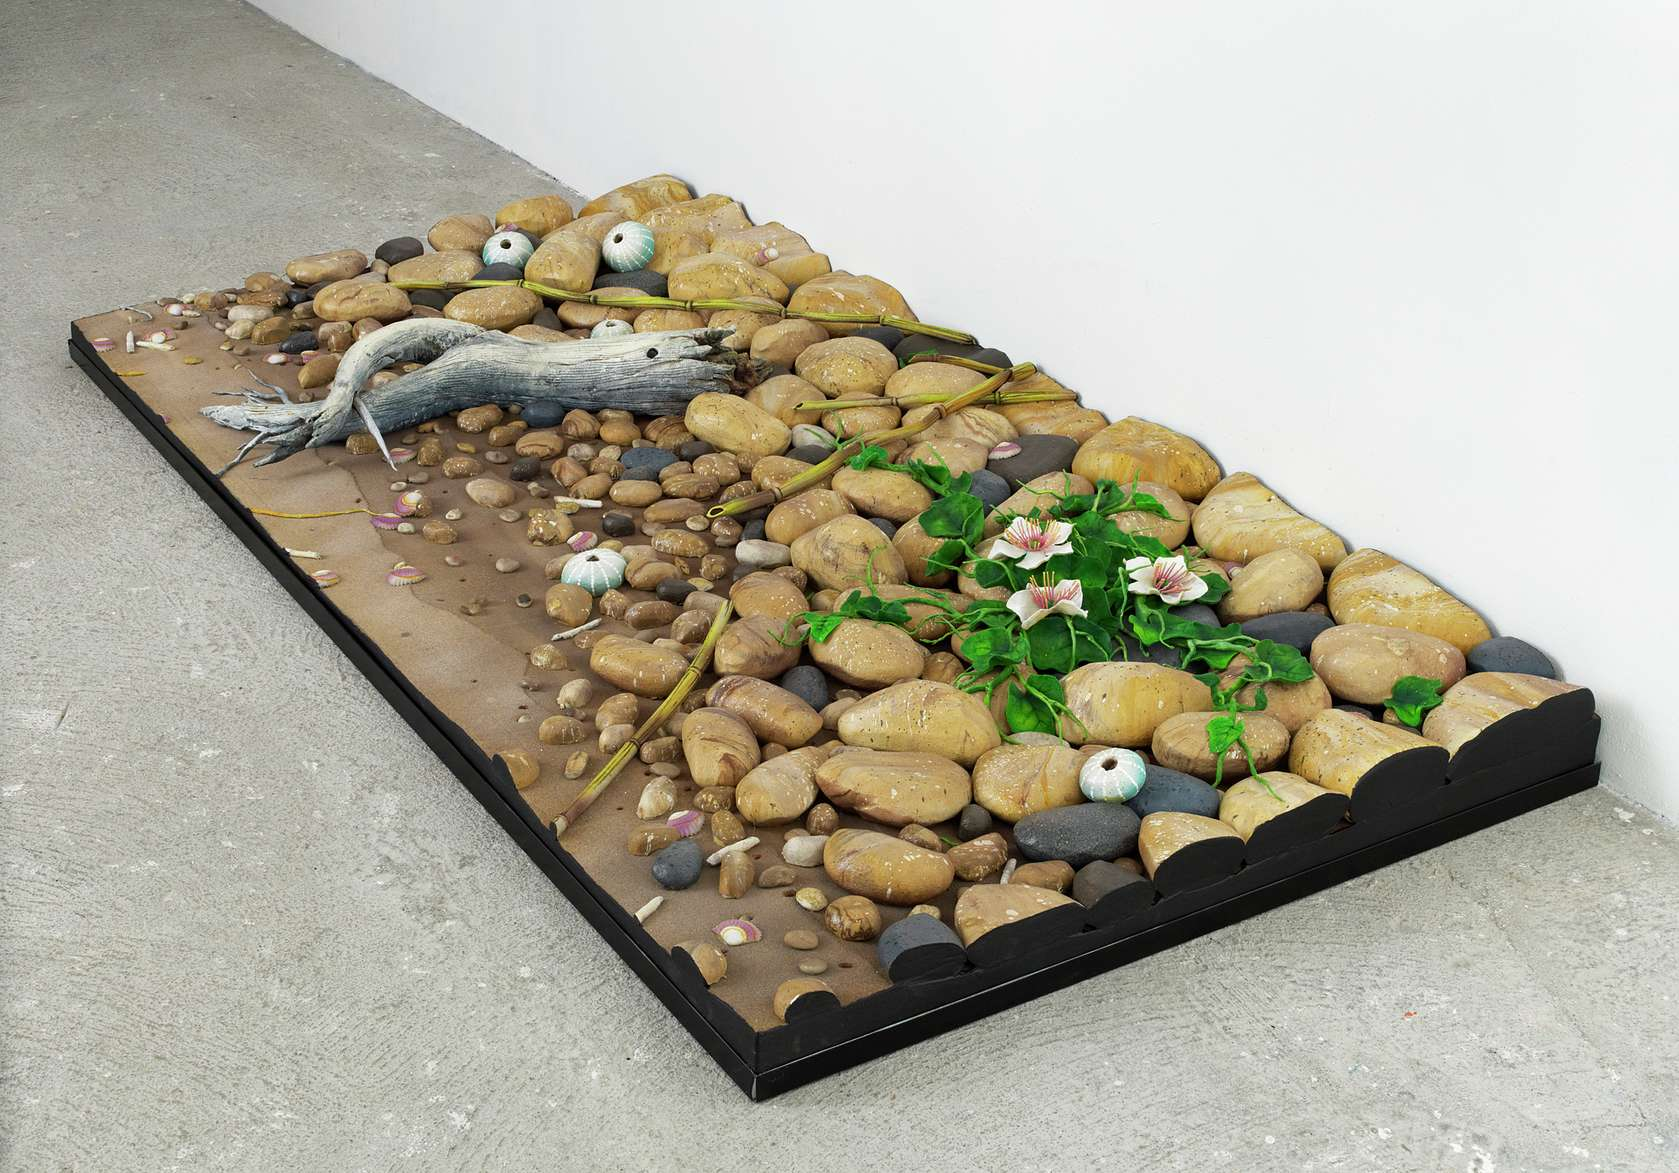 Piero Gilardi, Spiaggia con pino e capperi, 2010 mousse de polyuréthane100 x 200 x 20 cm / 39 3/8 x 78 6/8 x 7 7/8 inches